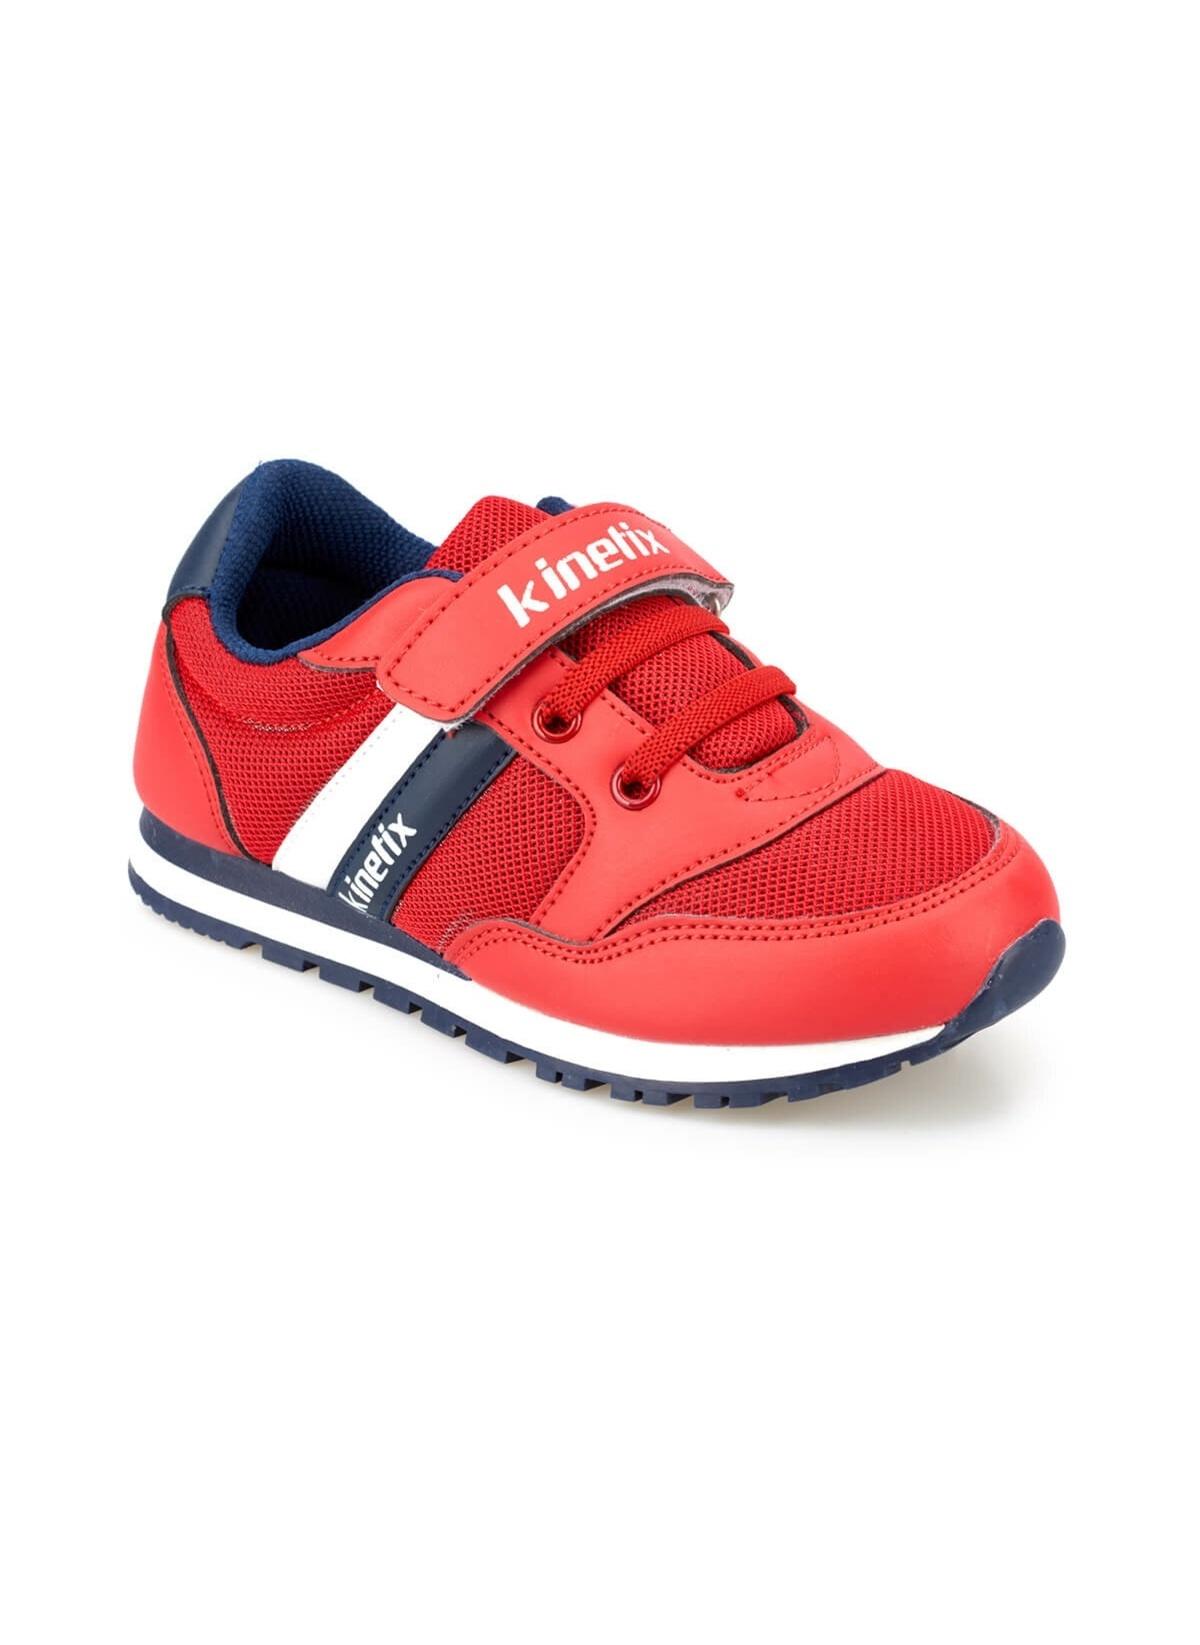 Kinetix Spor Ayakkabı Payof Sneaker – 69.99 TL